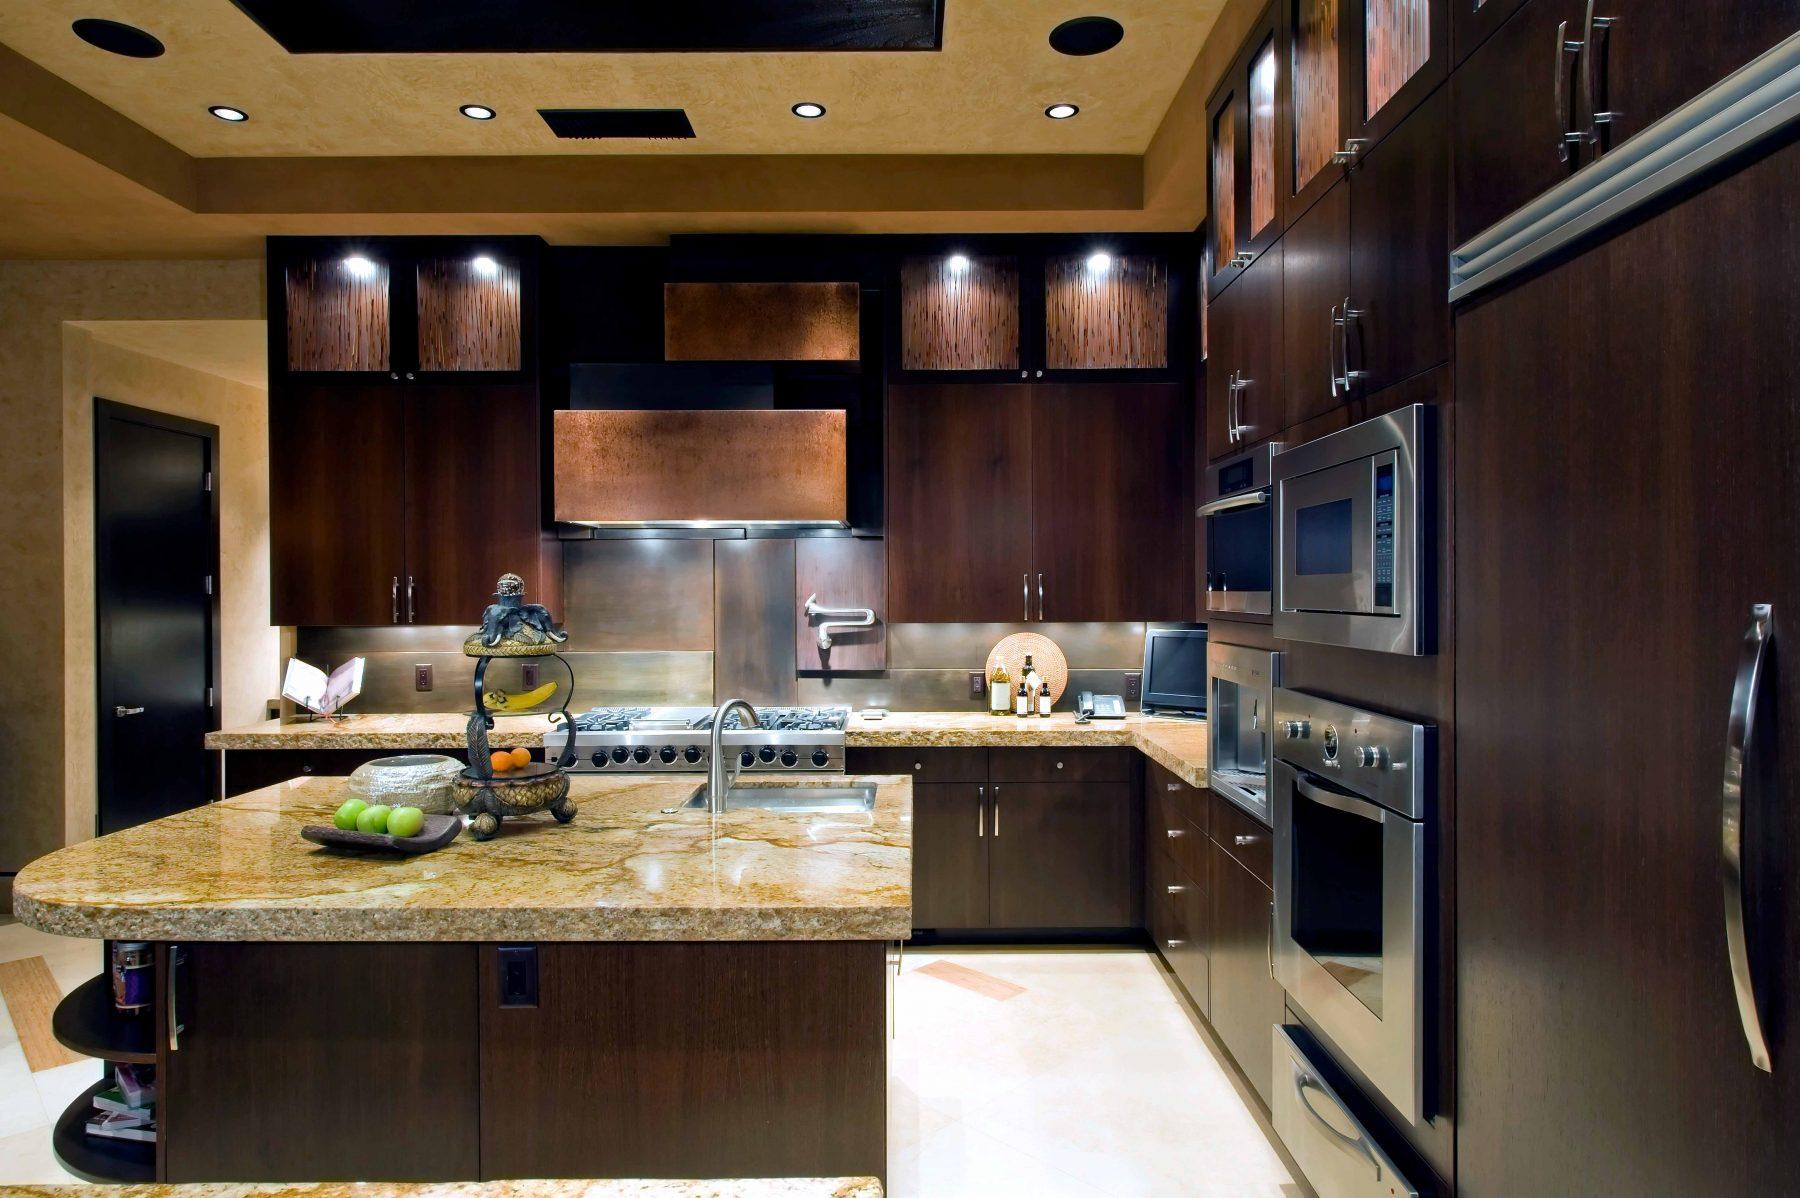 Modern kitchen in blog about kitchen plumbing problems.